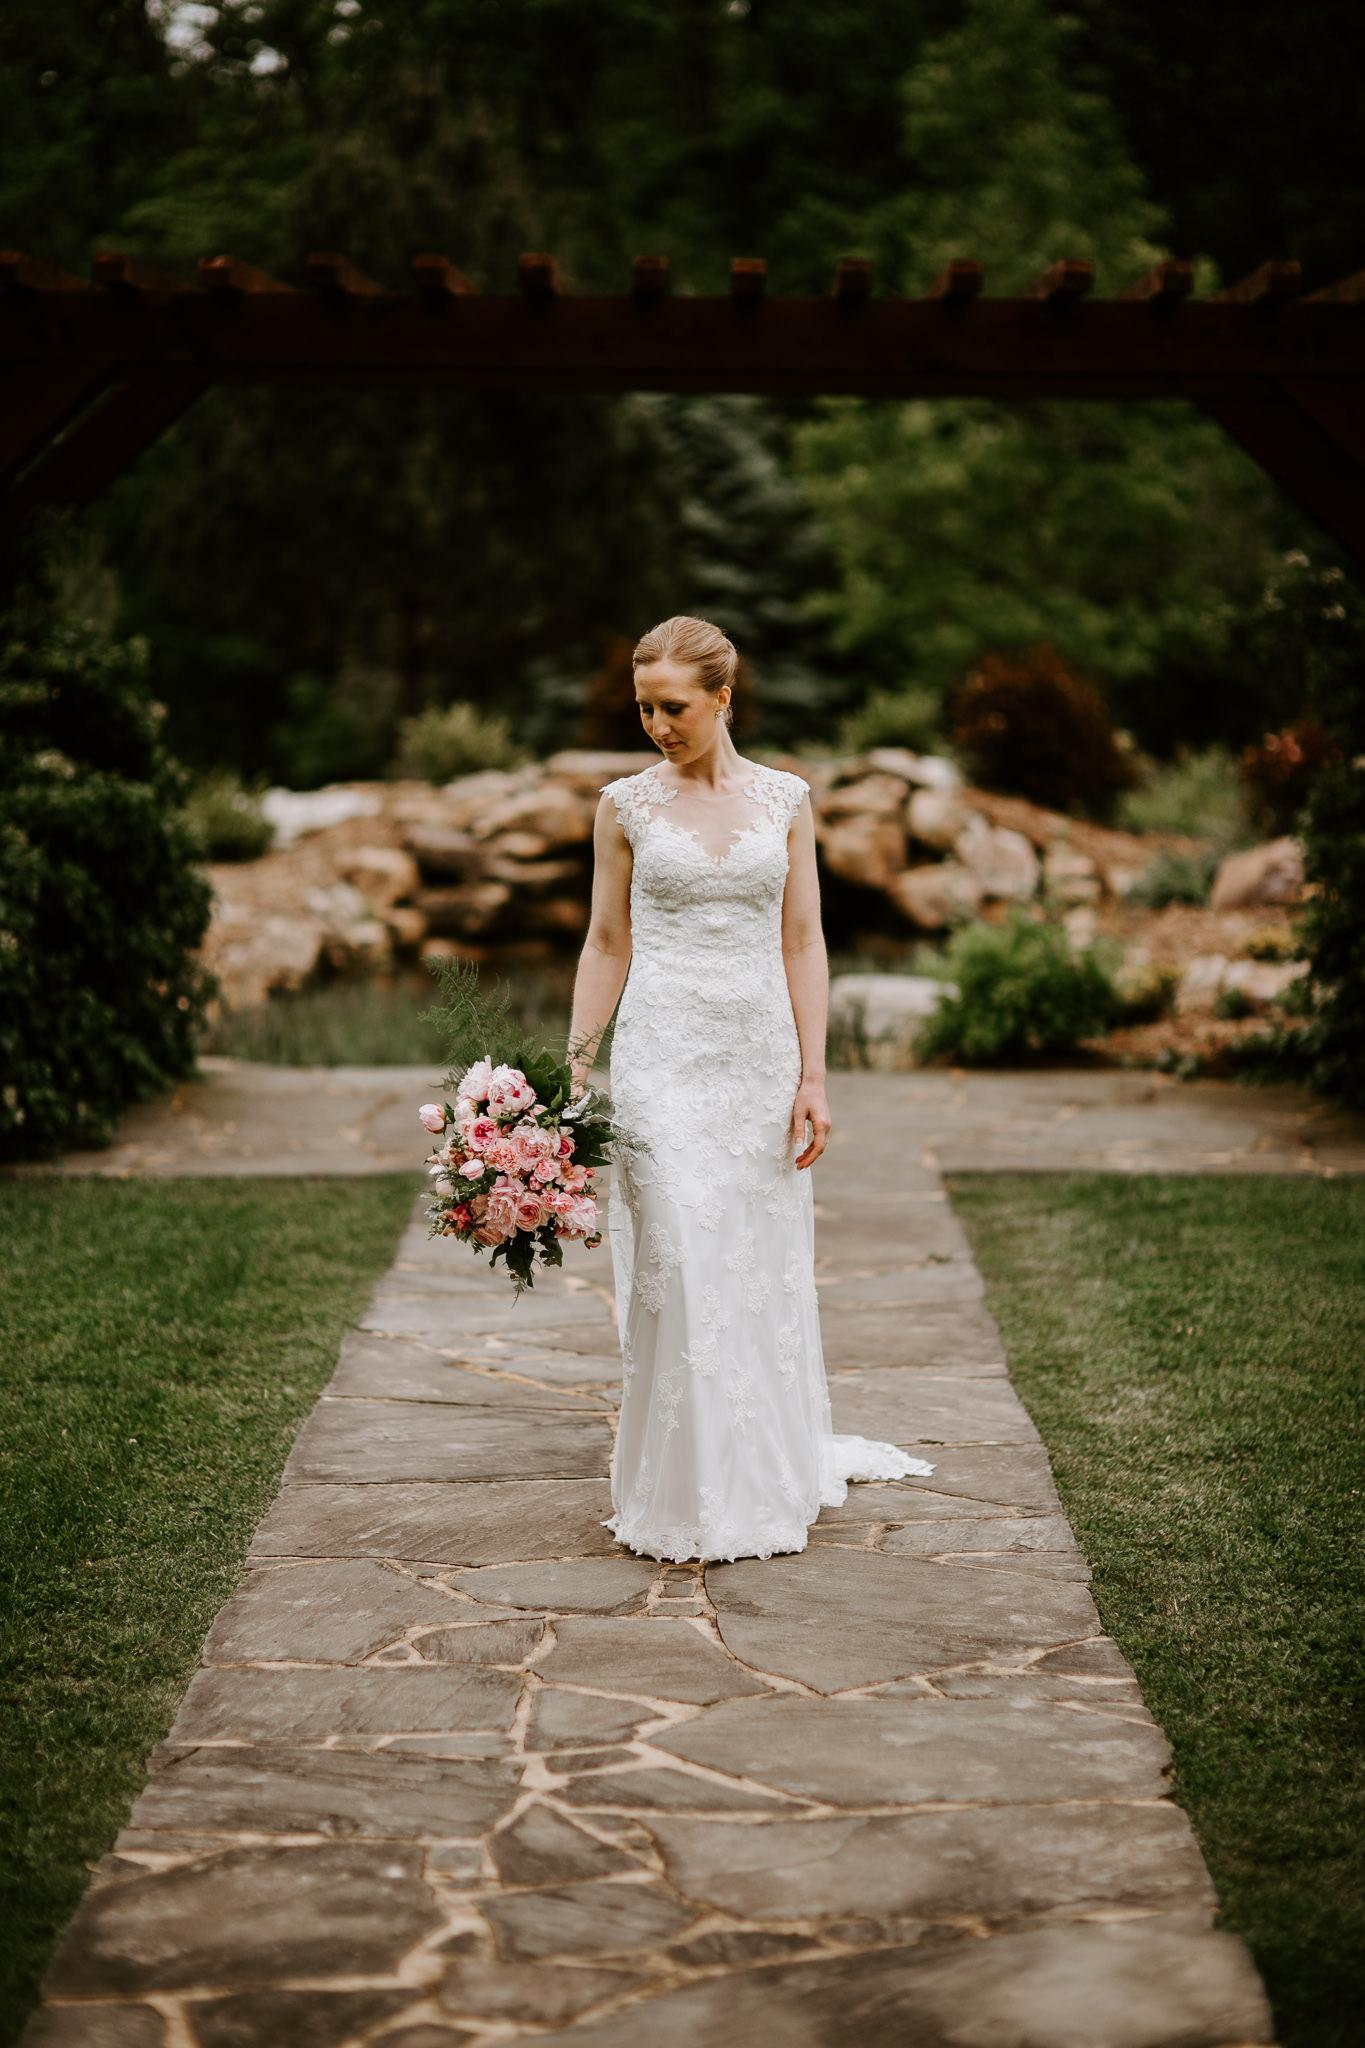 House Mountain Inn - Weddings - Lexington - Virginia - Best Wedding Photographer - Pat Cori Photography-46.jpg